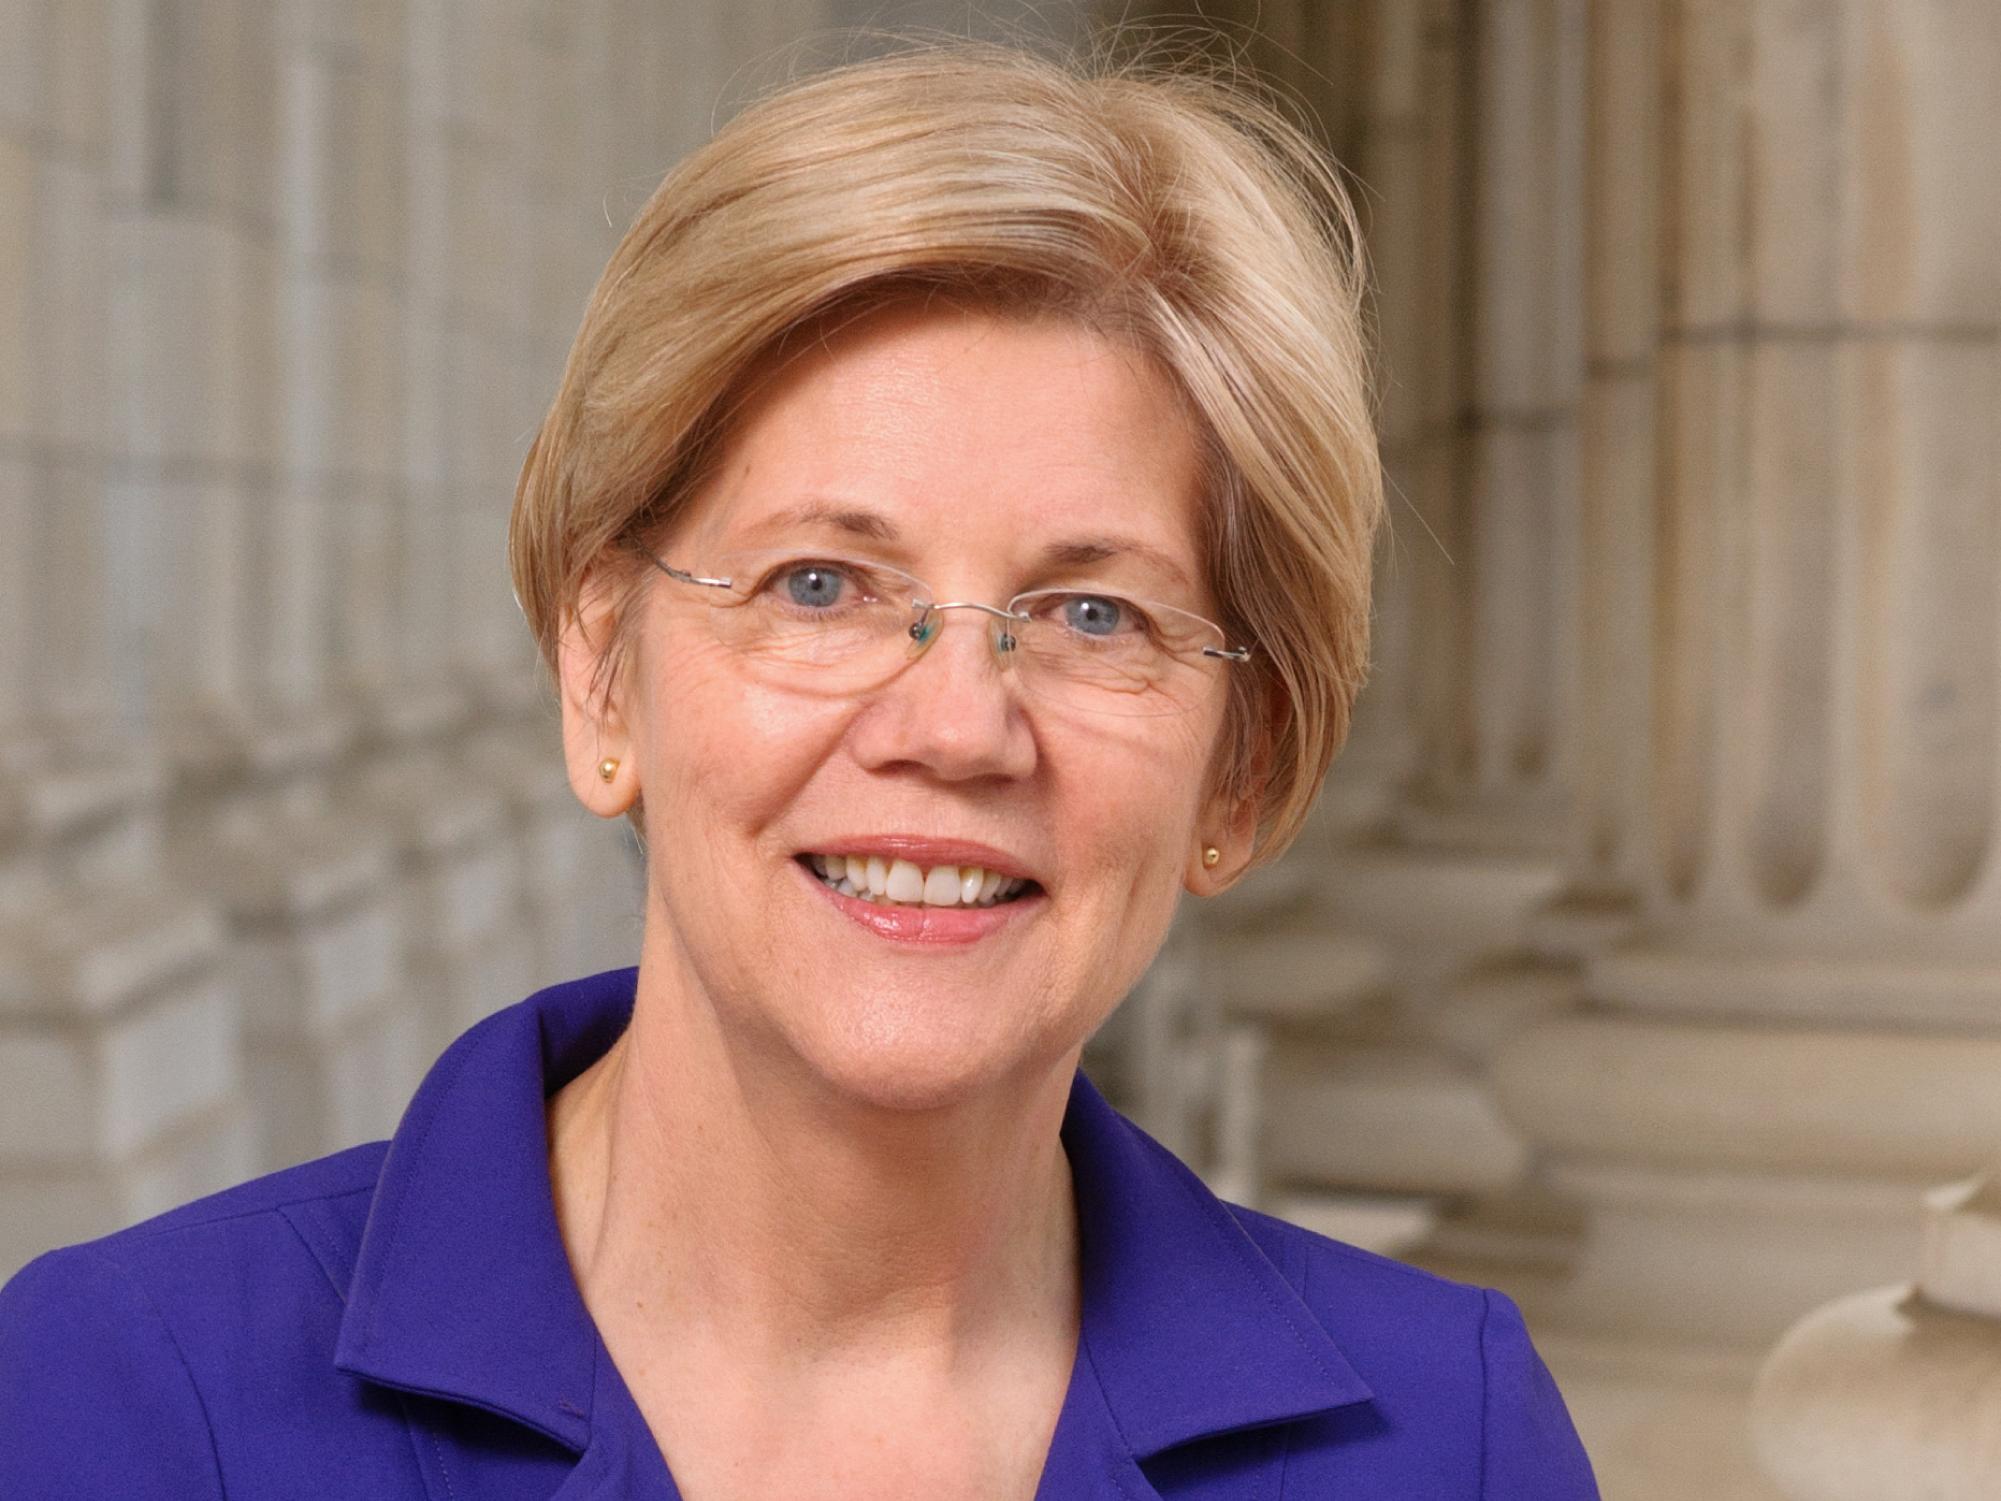 2020 Presidential Candidate Elizabeth Warren